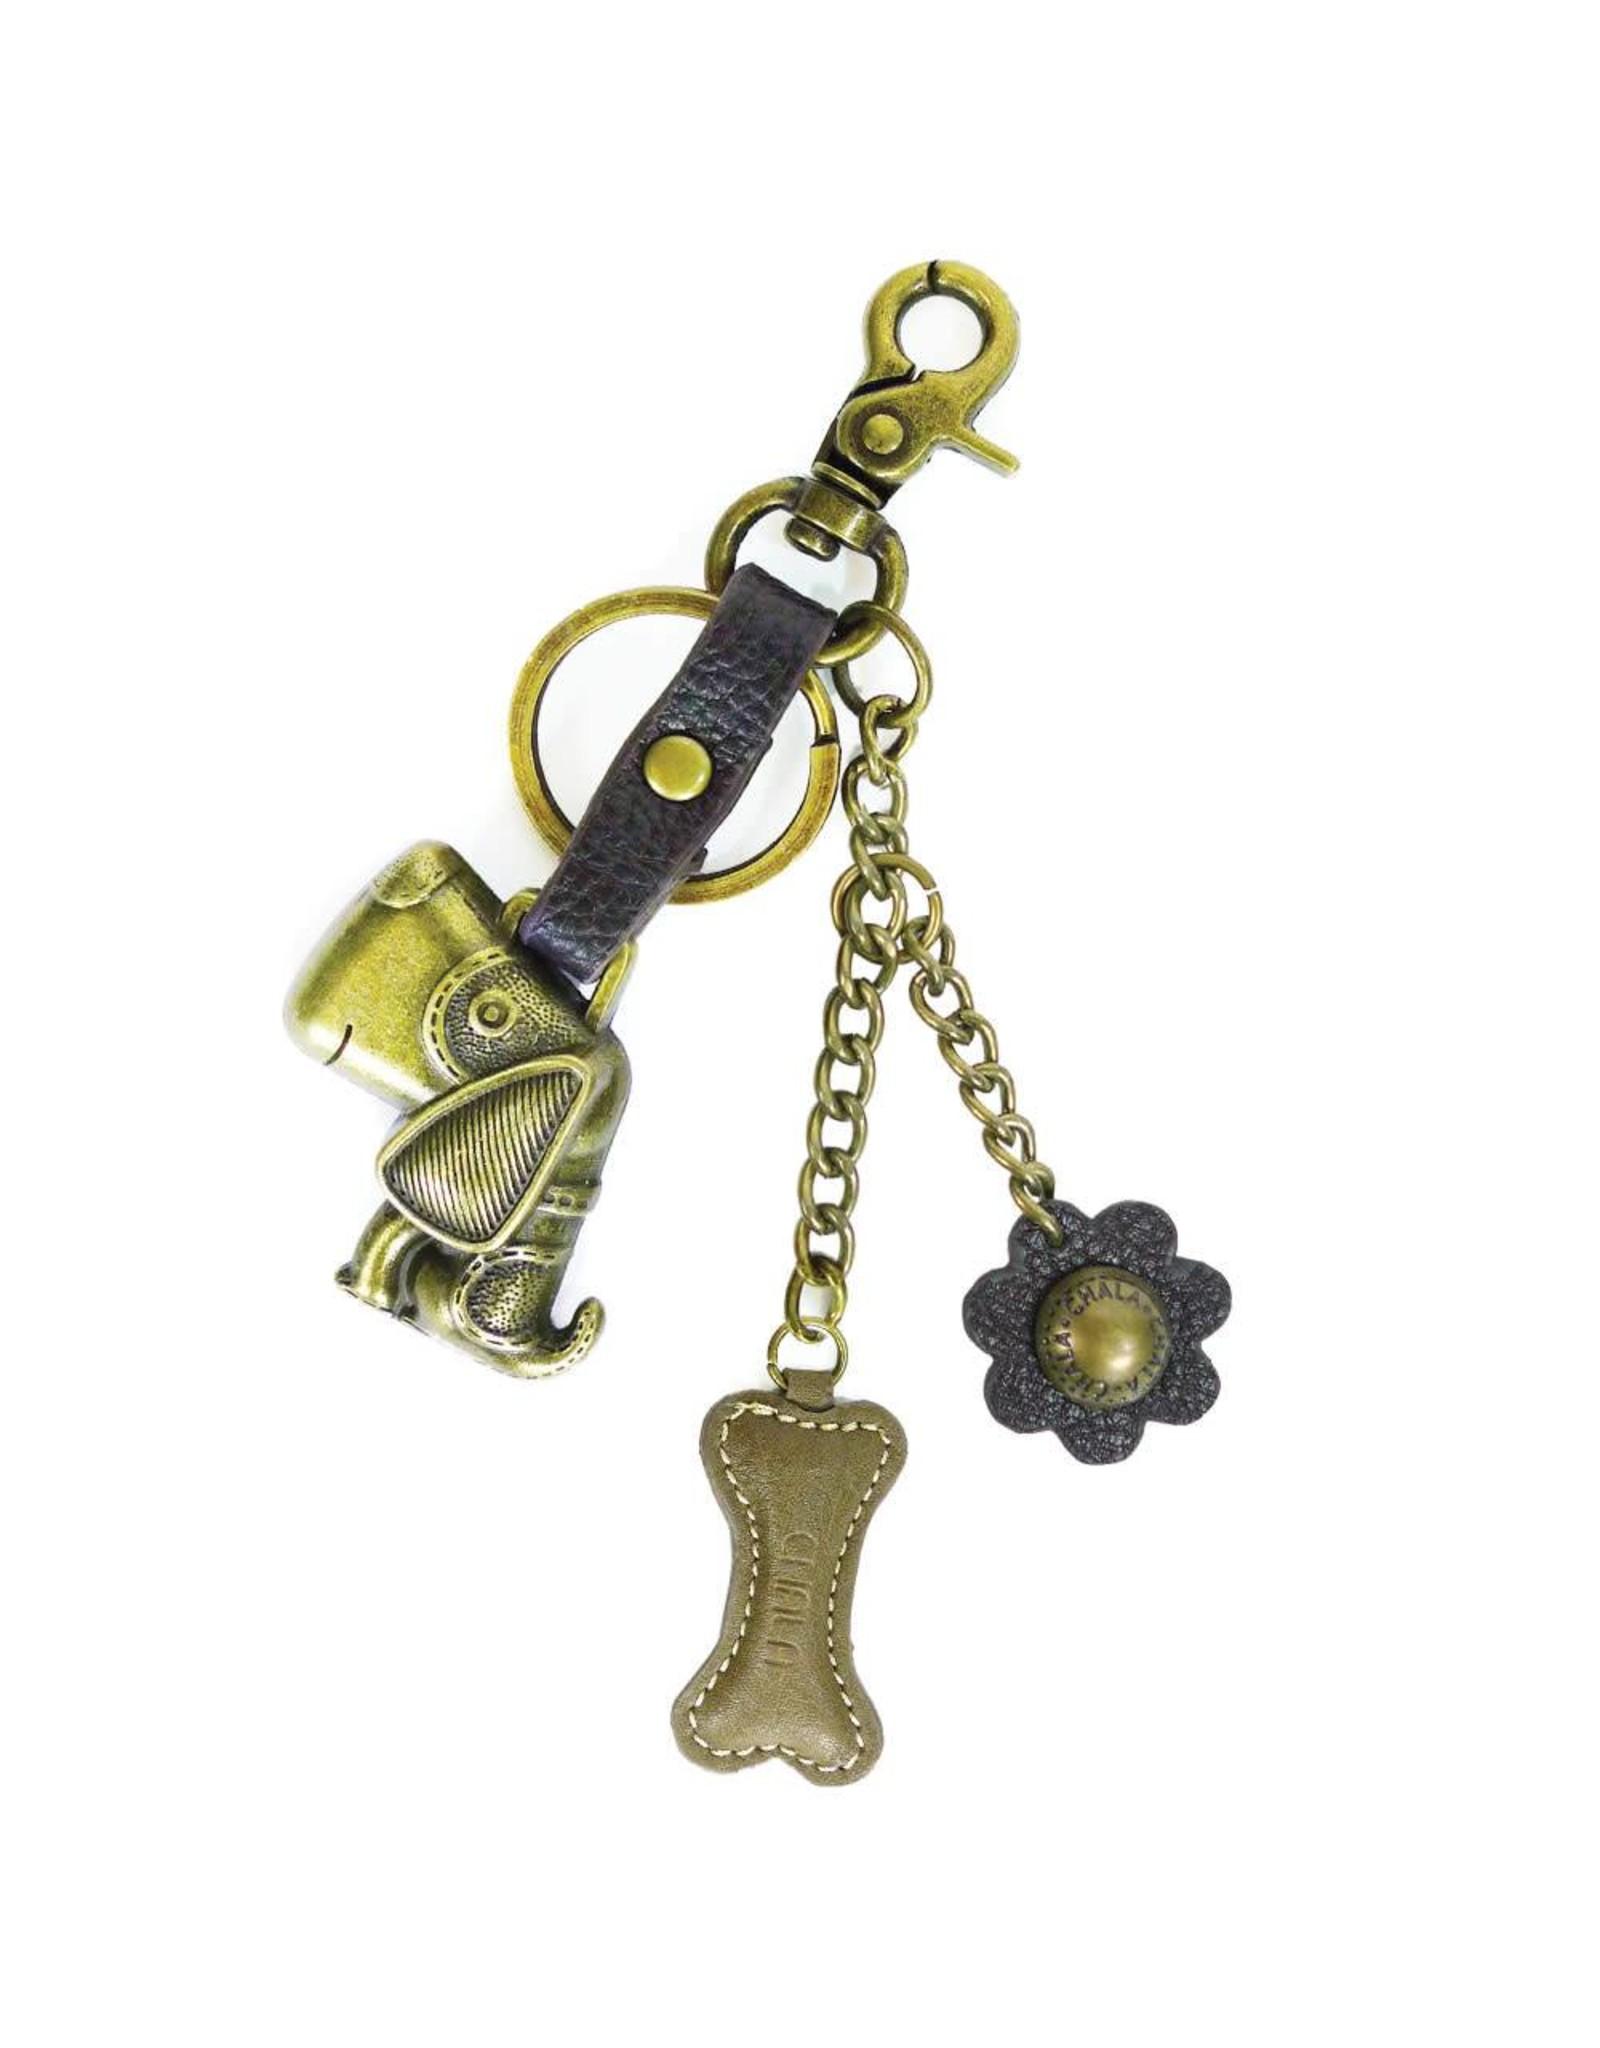 Chala Charming Key Chain Dog